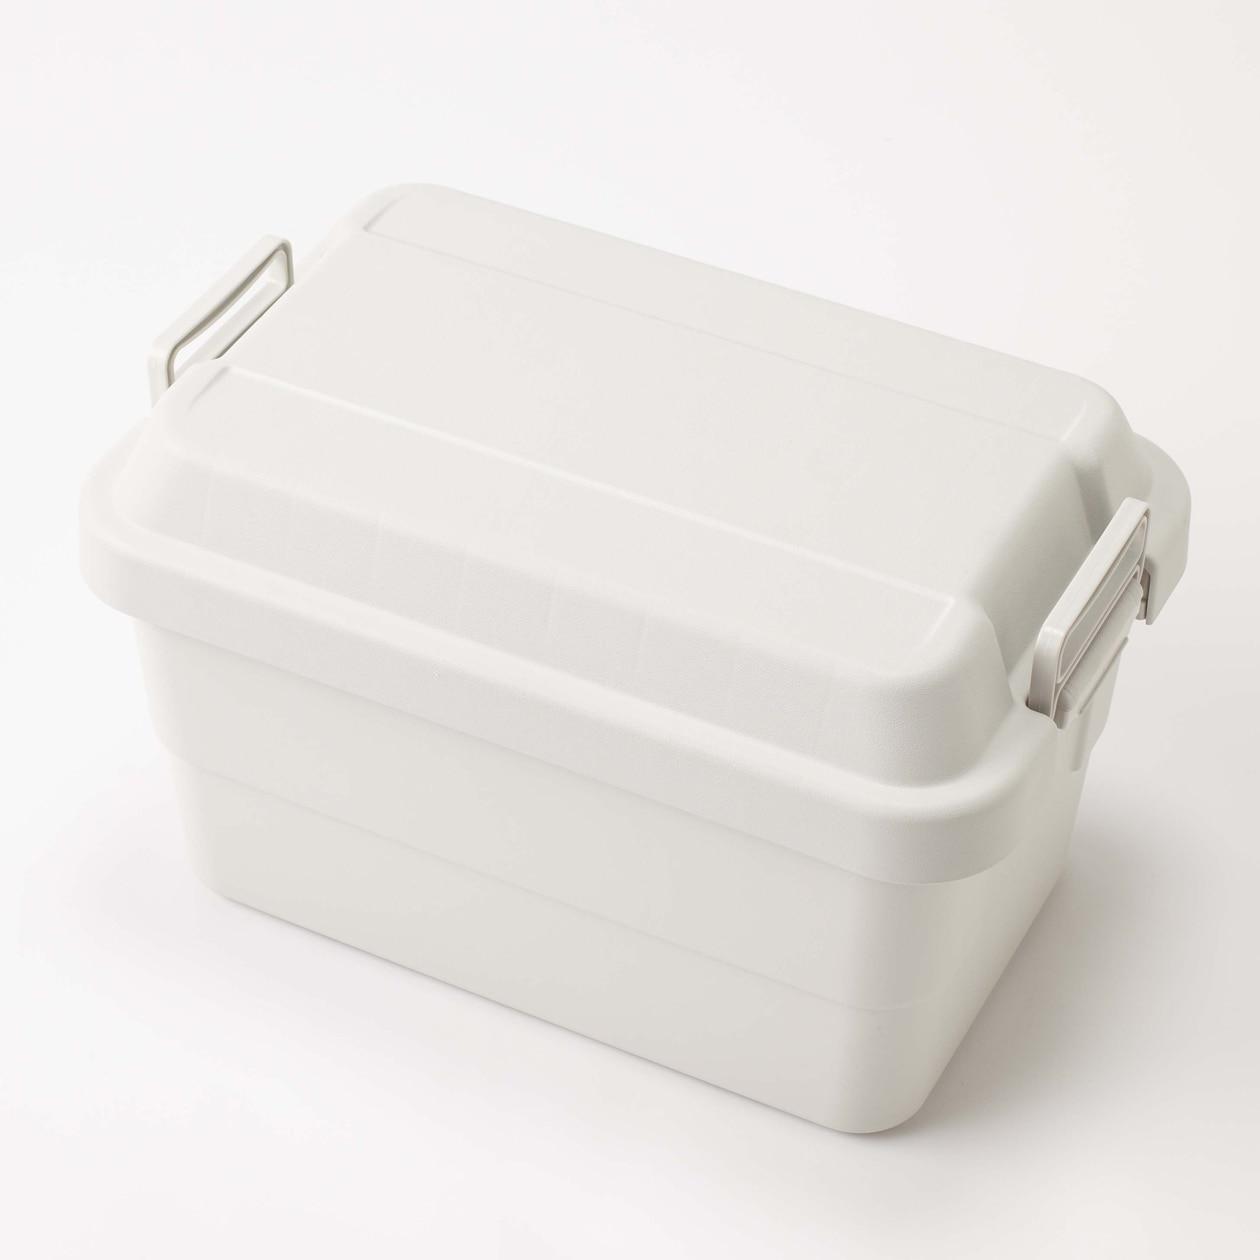 PP密封儲物箱 - 大   無印良品 MUJI